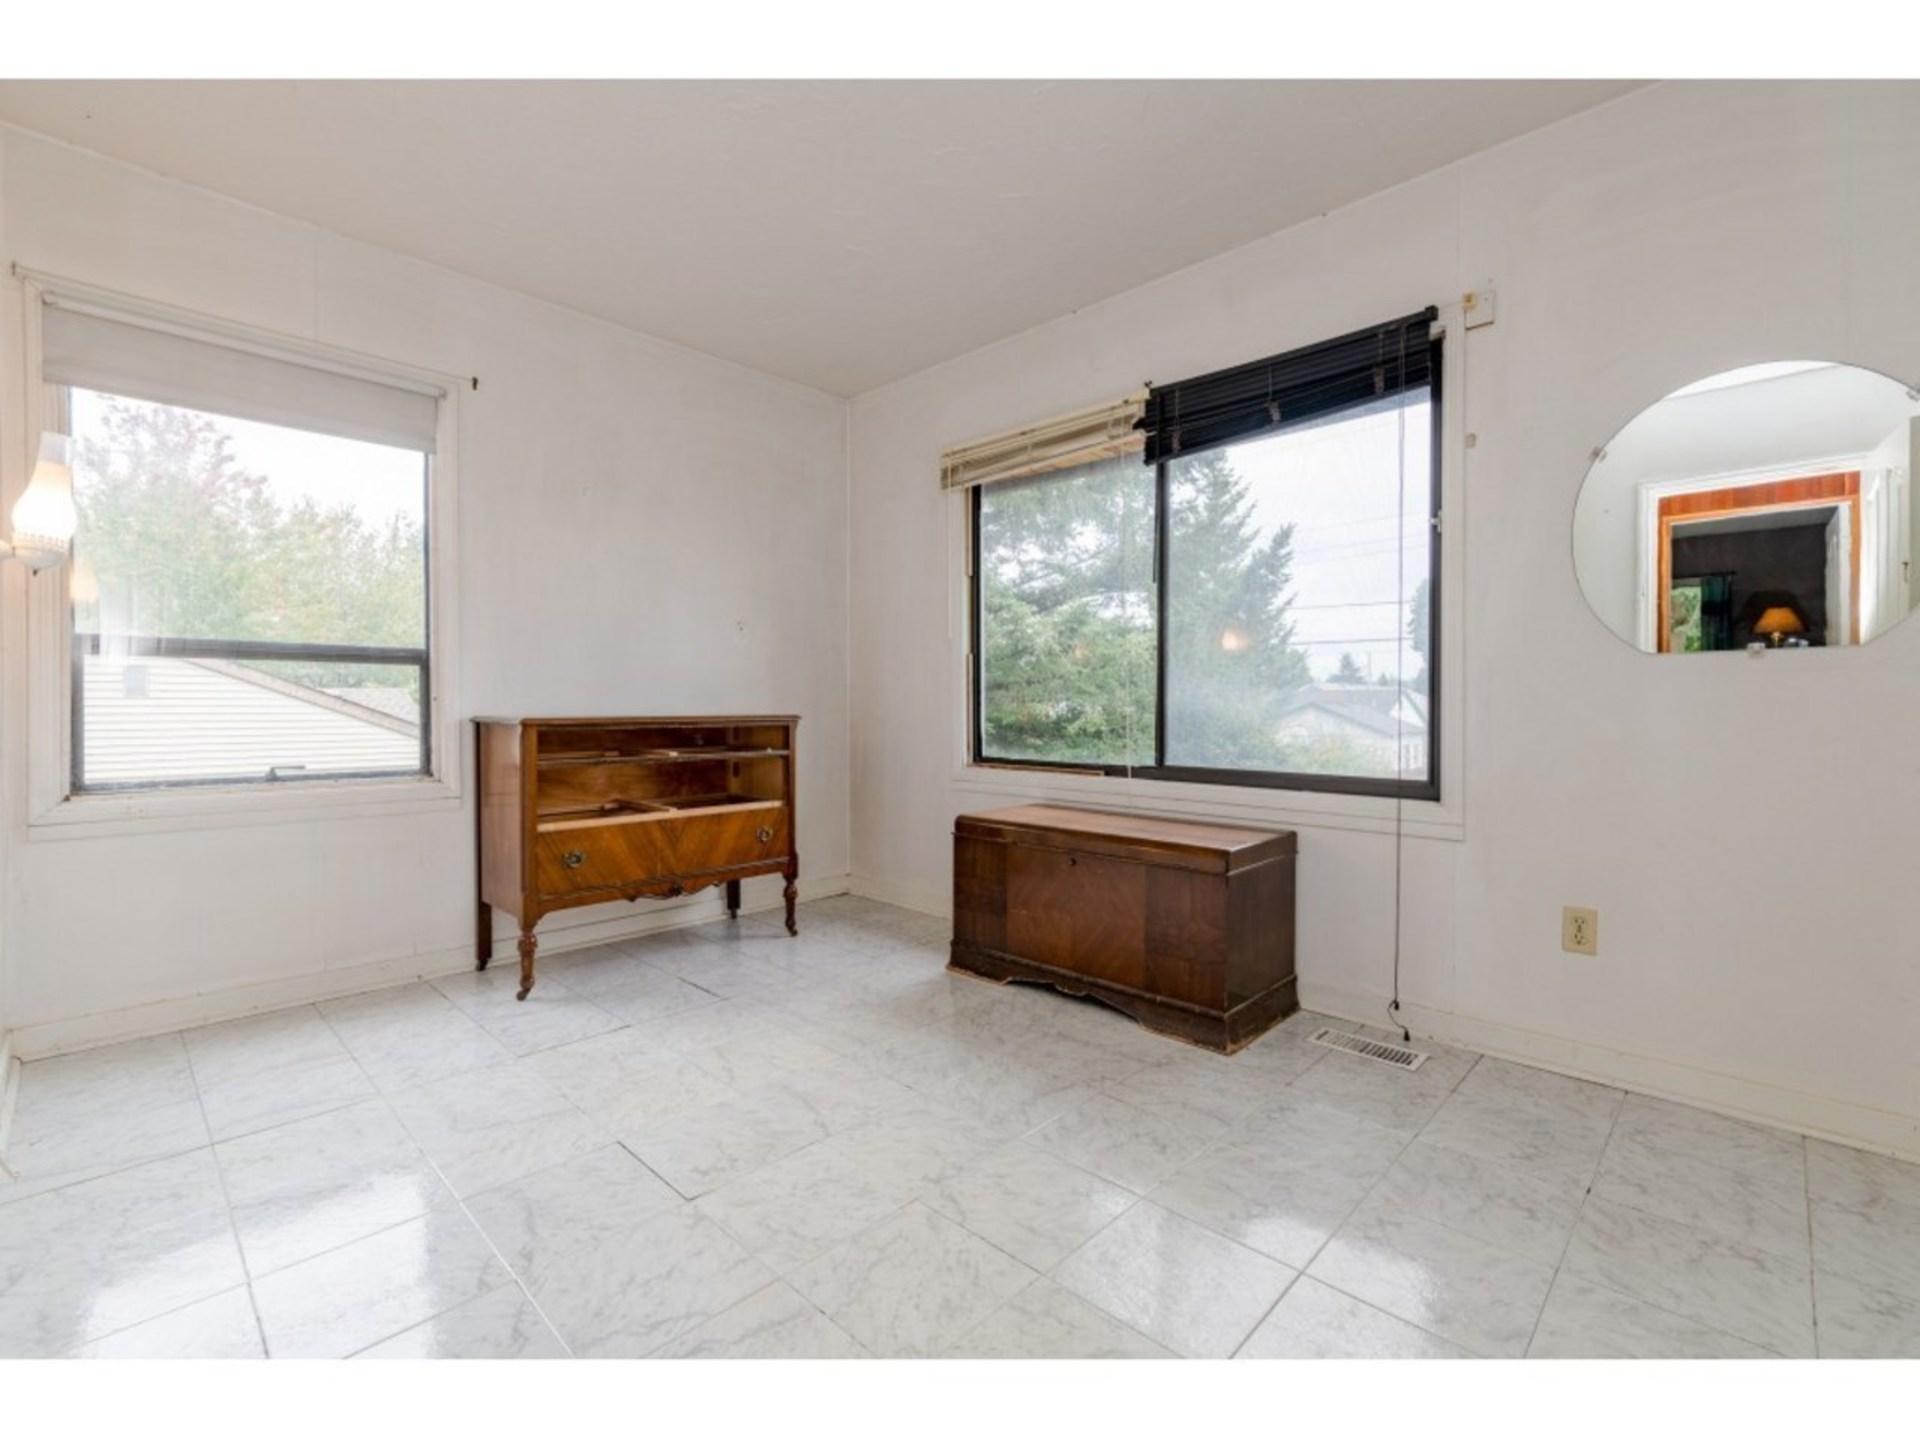 5771-172-street-cloverdale-bc-cloverdale-09 at 5771 172 Street, Cloverdale BC, Cloverdale